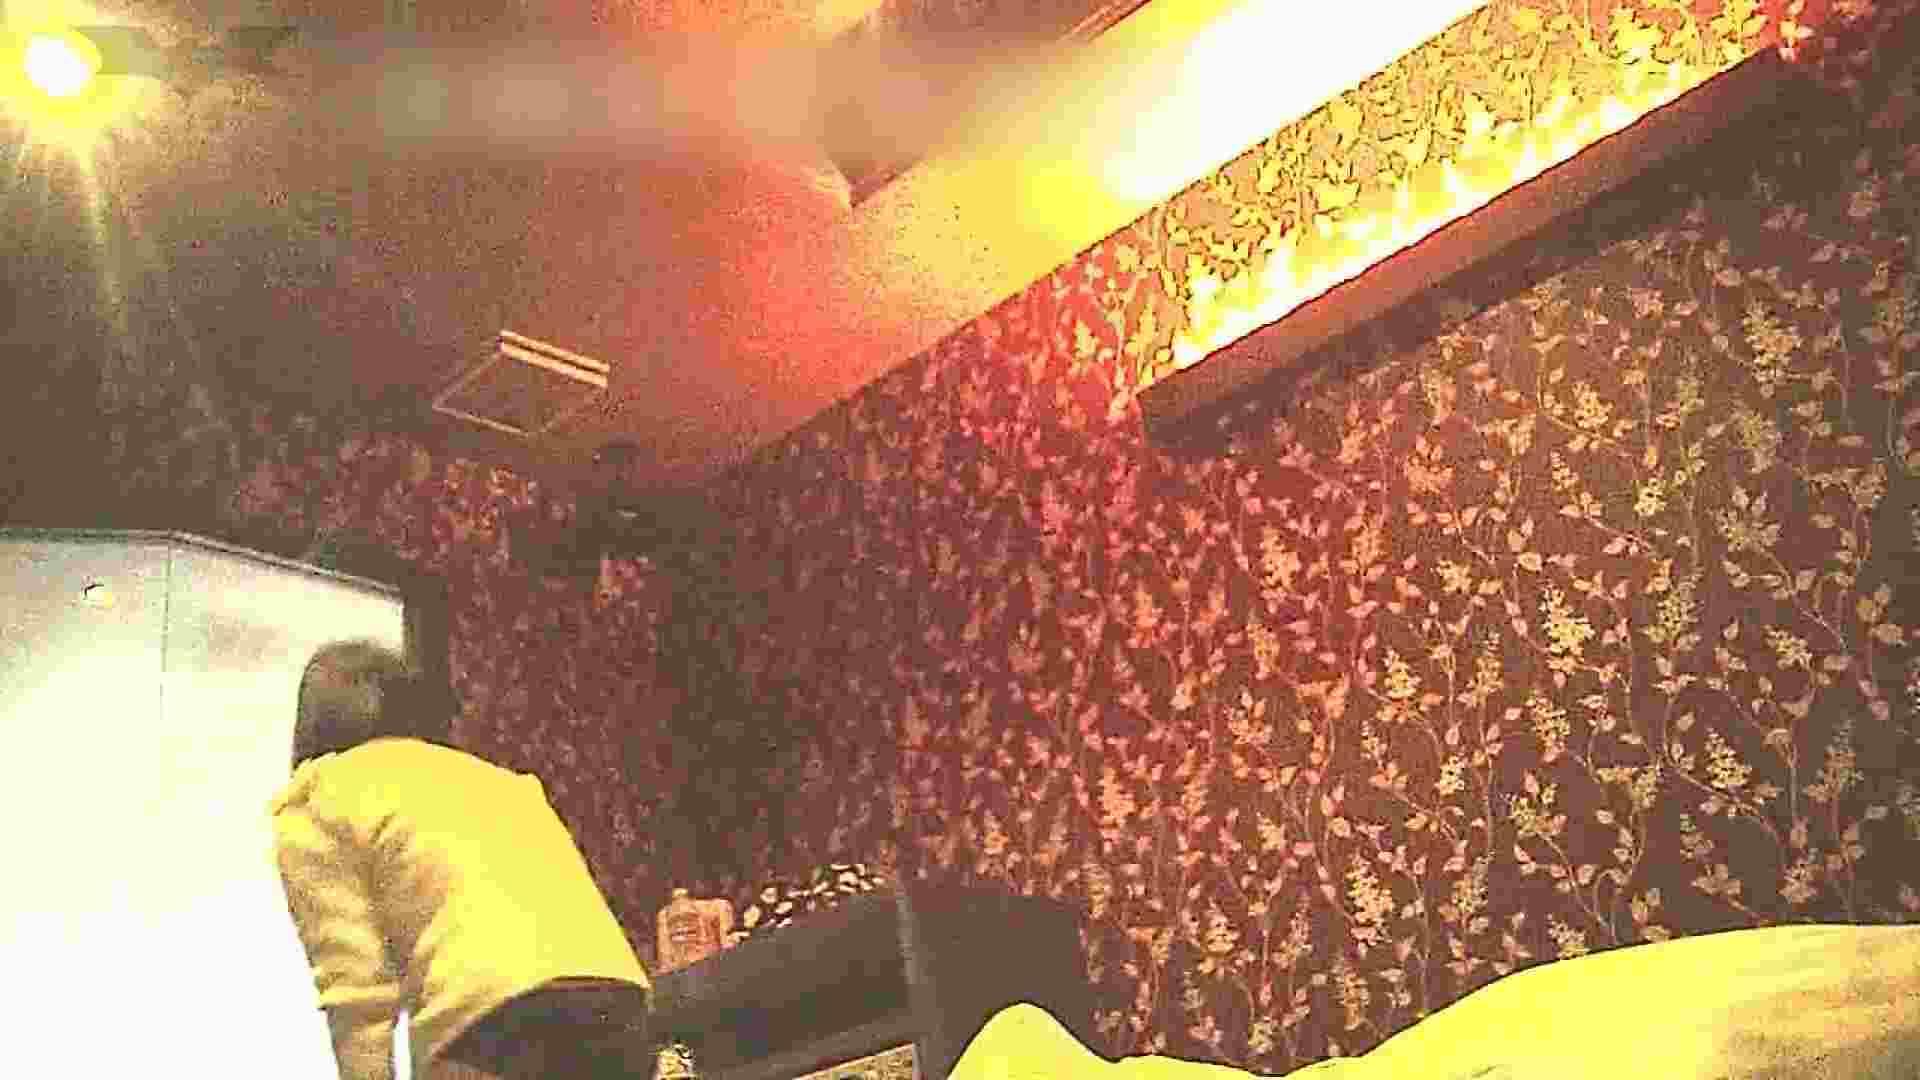 ▲2017_05位▲ 学園アイドル美人女子大生!❶4人厳選詰合せVol.49 人気作   女子大生  113画像 68